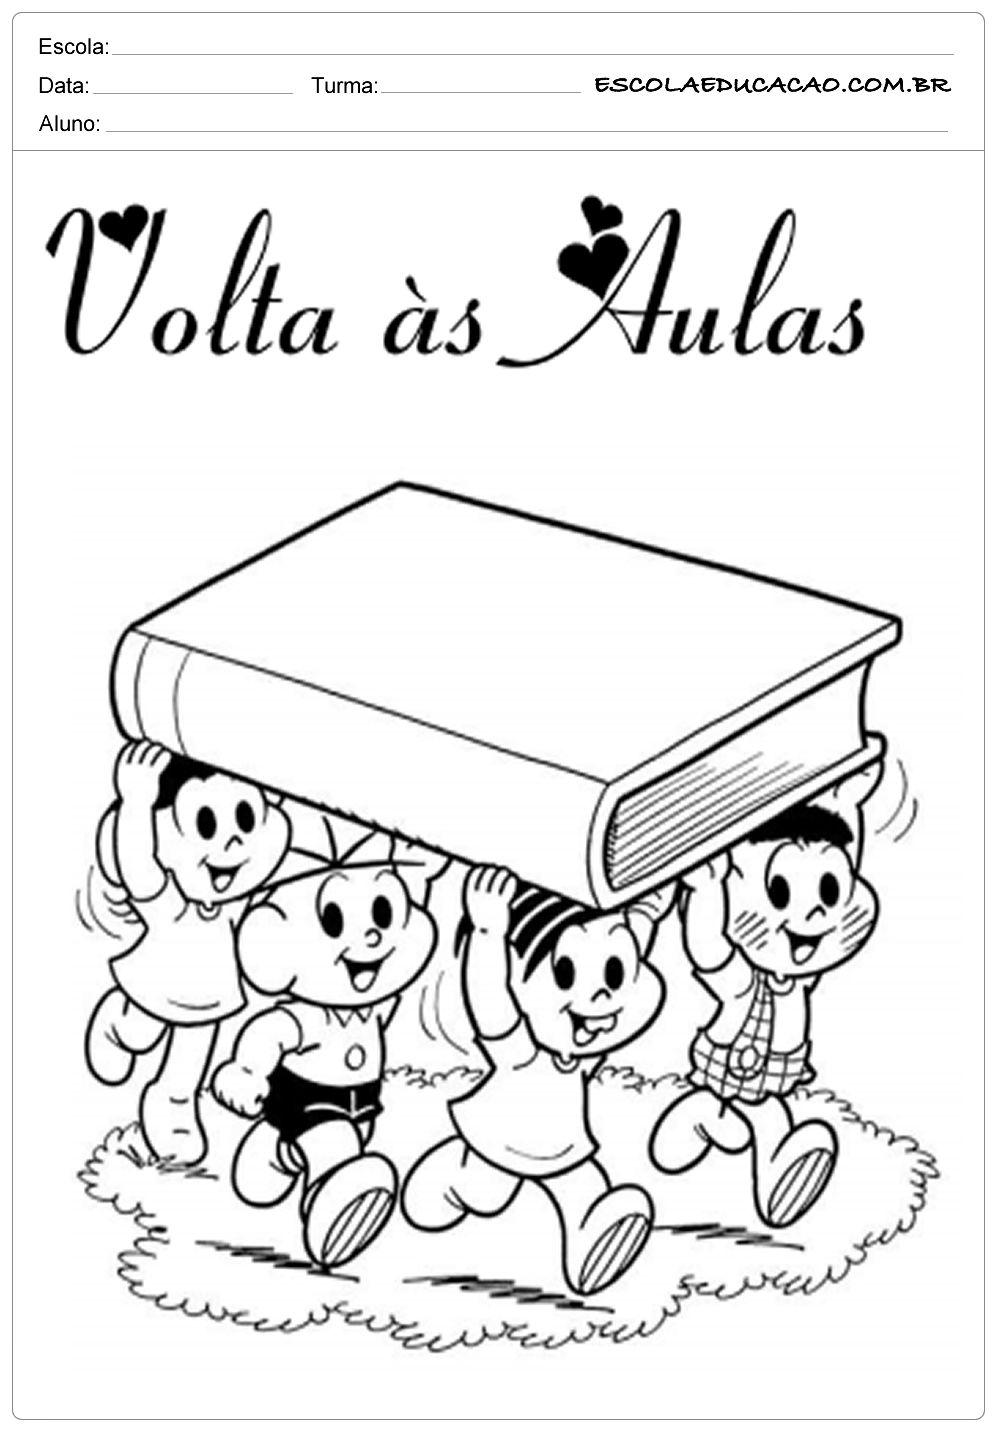 Educacao Com Professores Online Volta As Aulas Doodles